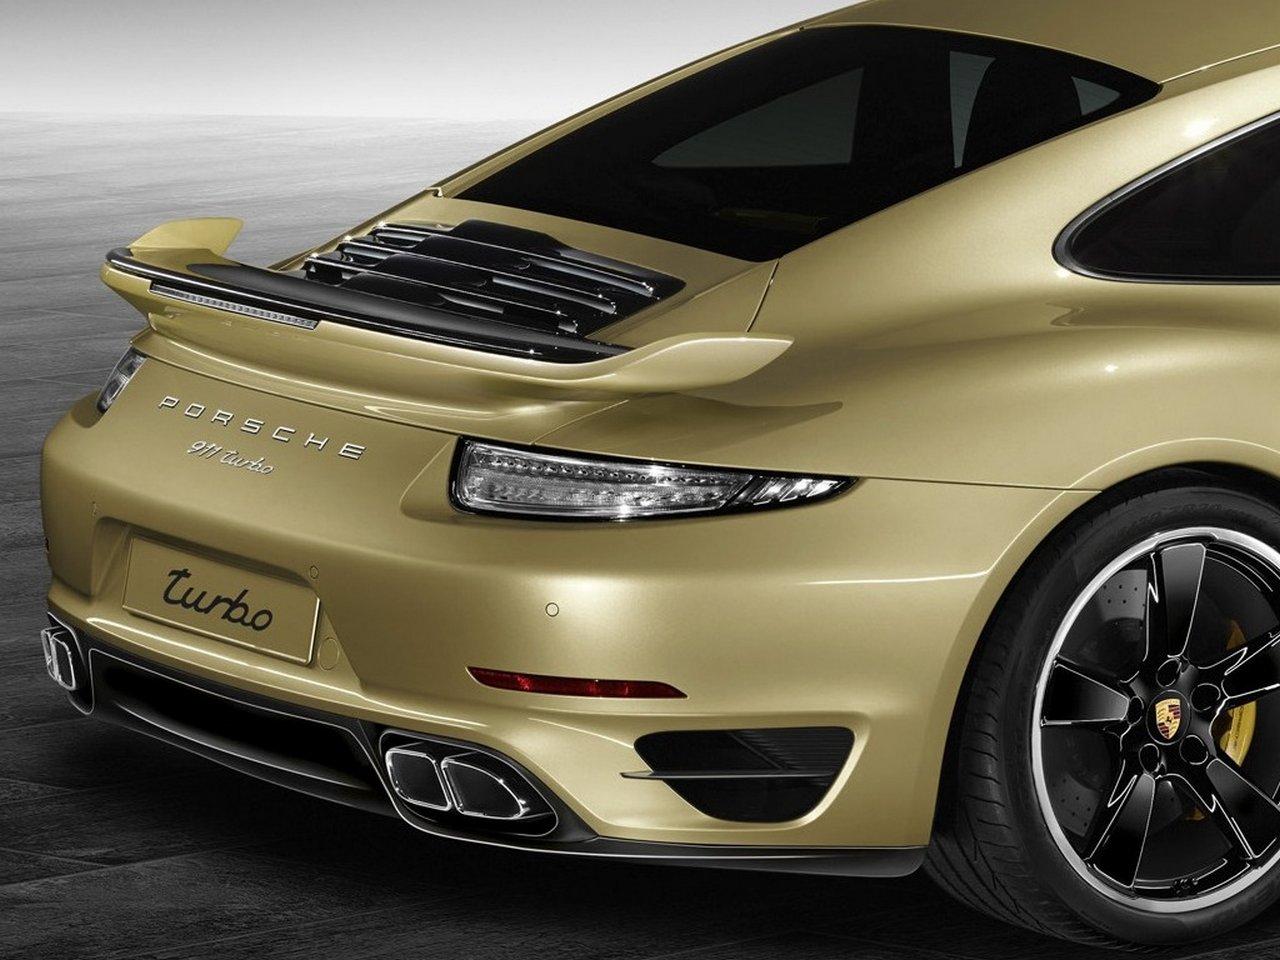 porsche-nuovo-aerokit-per-911-991-turbo-turbo-s_0-100_5